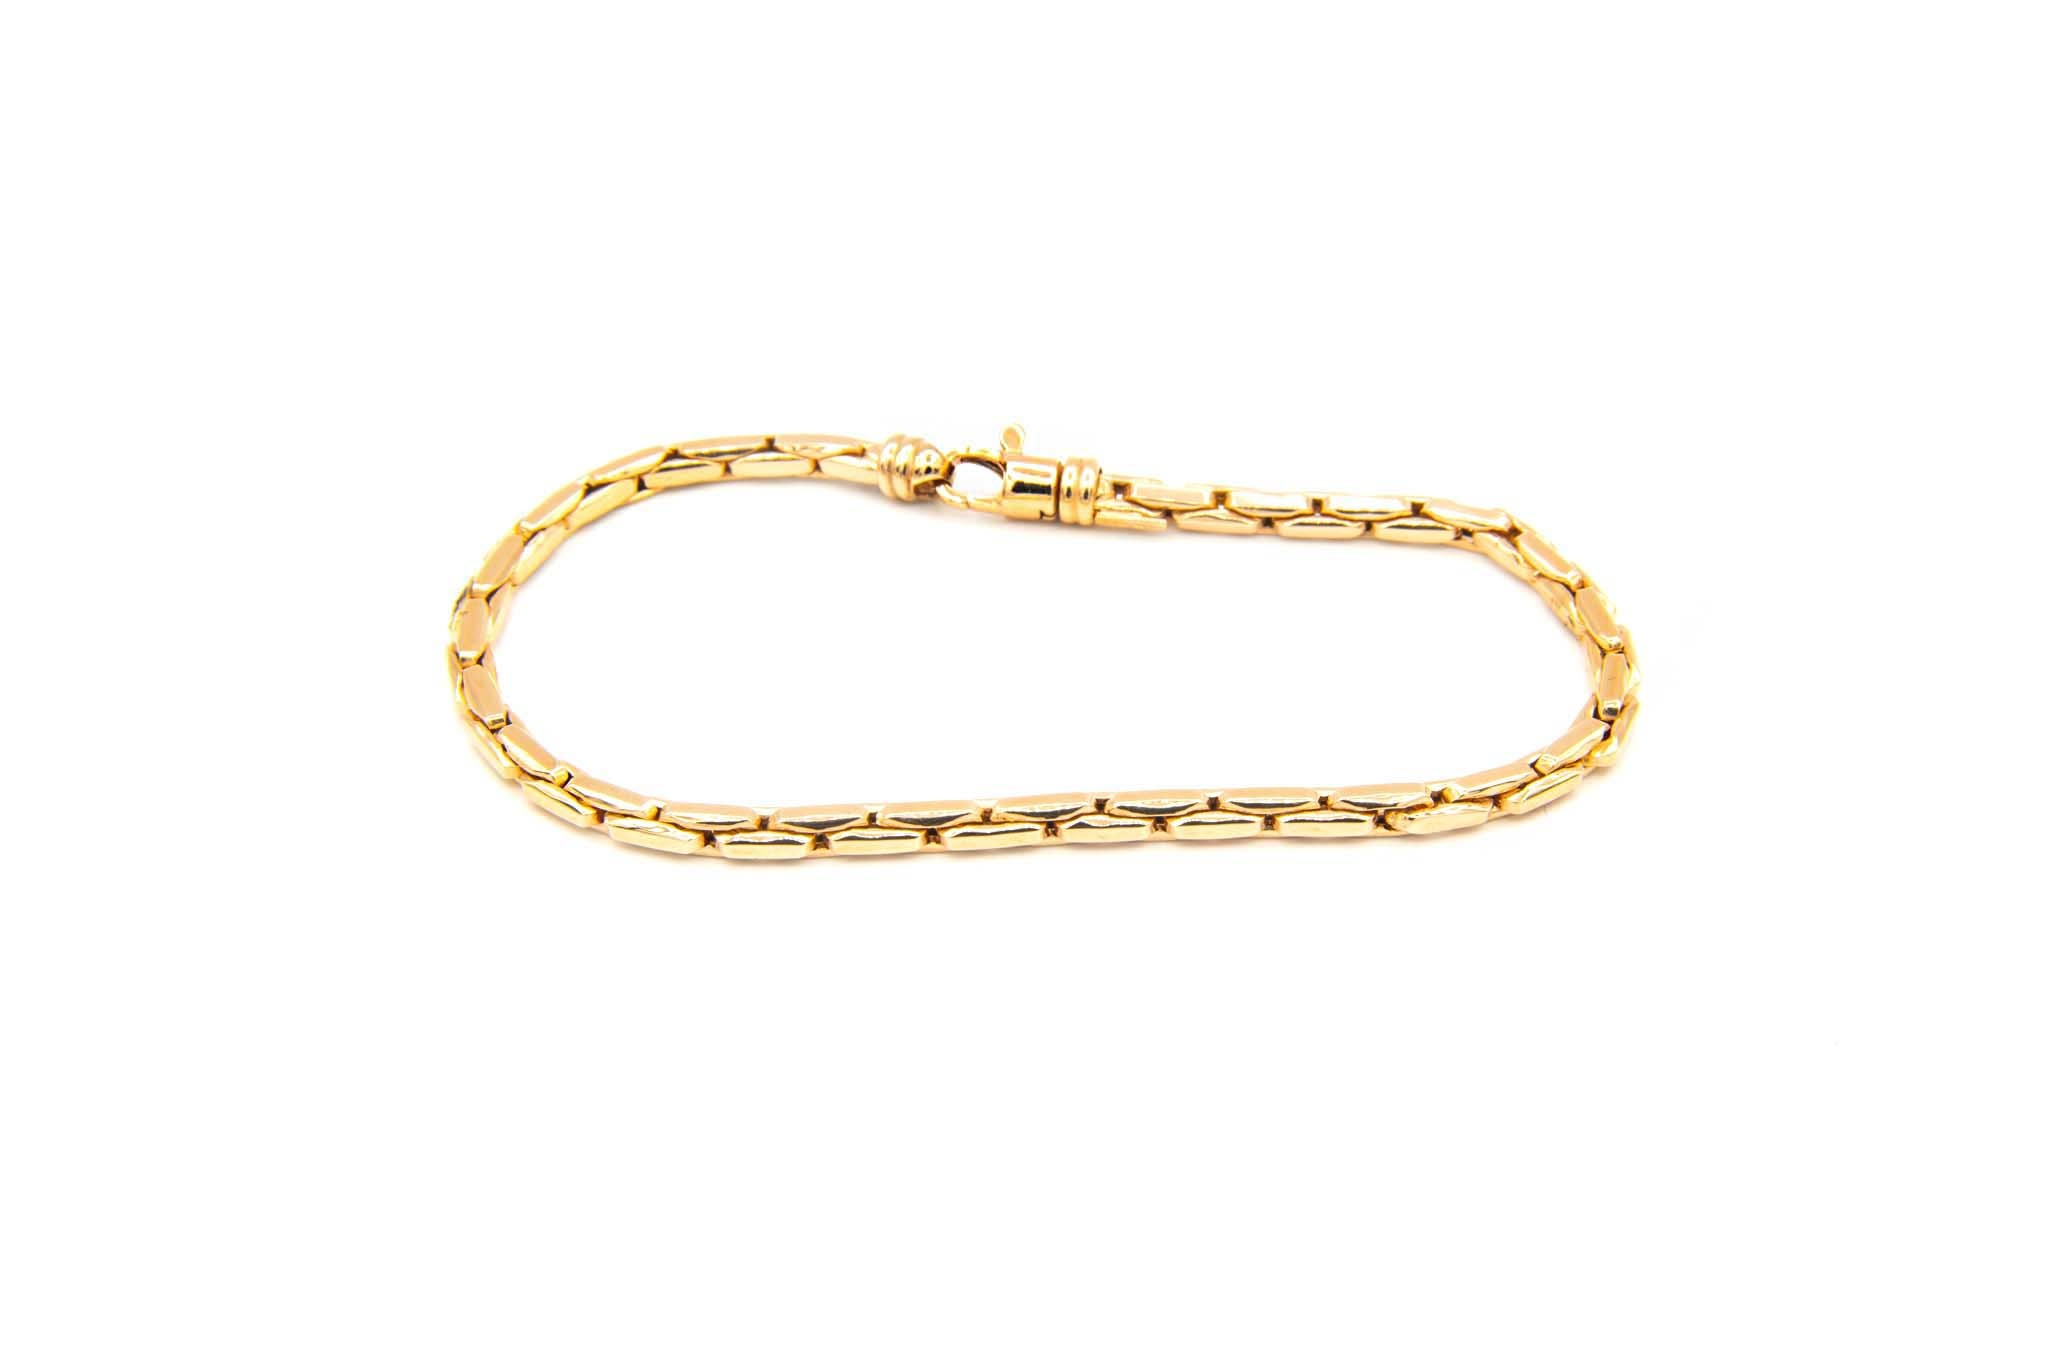 Armband met Cardano schakel-1